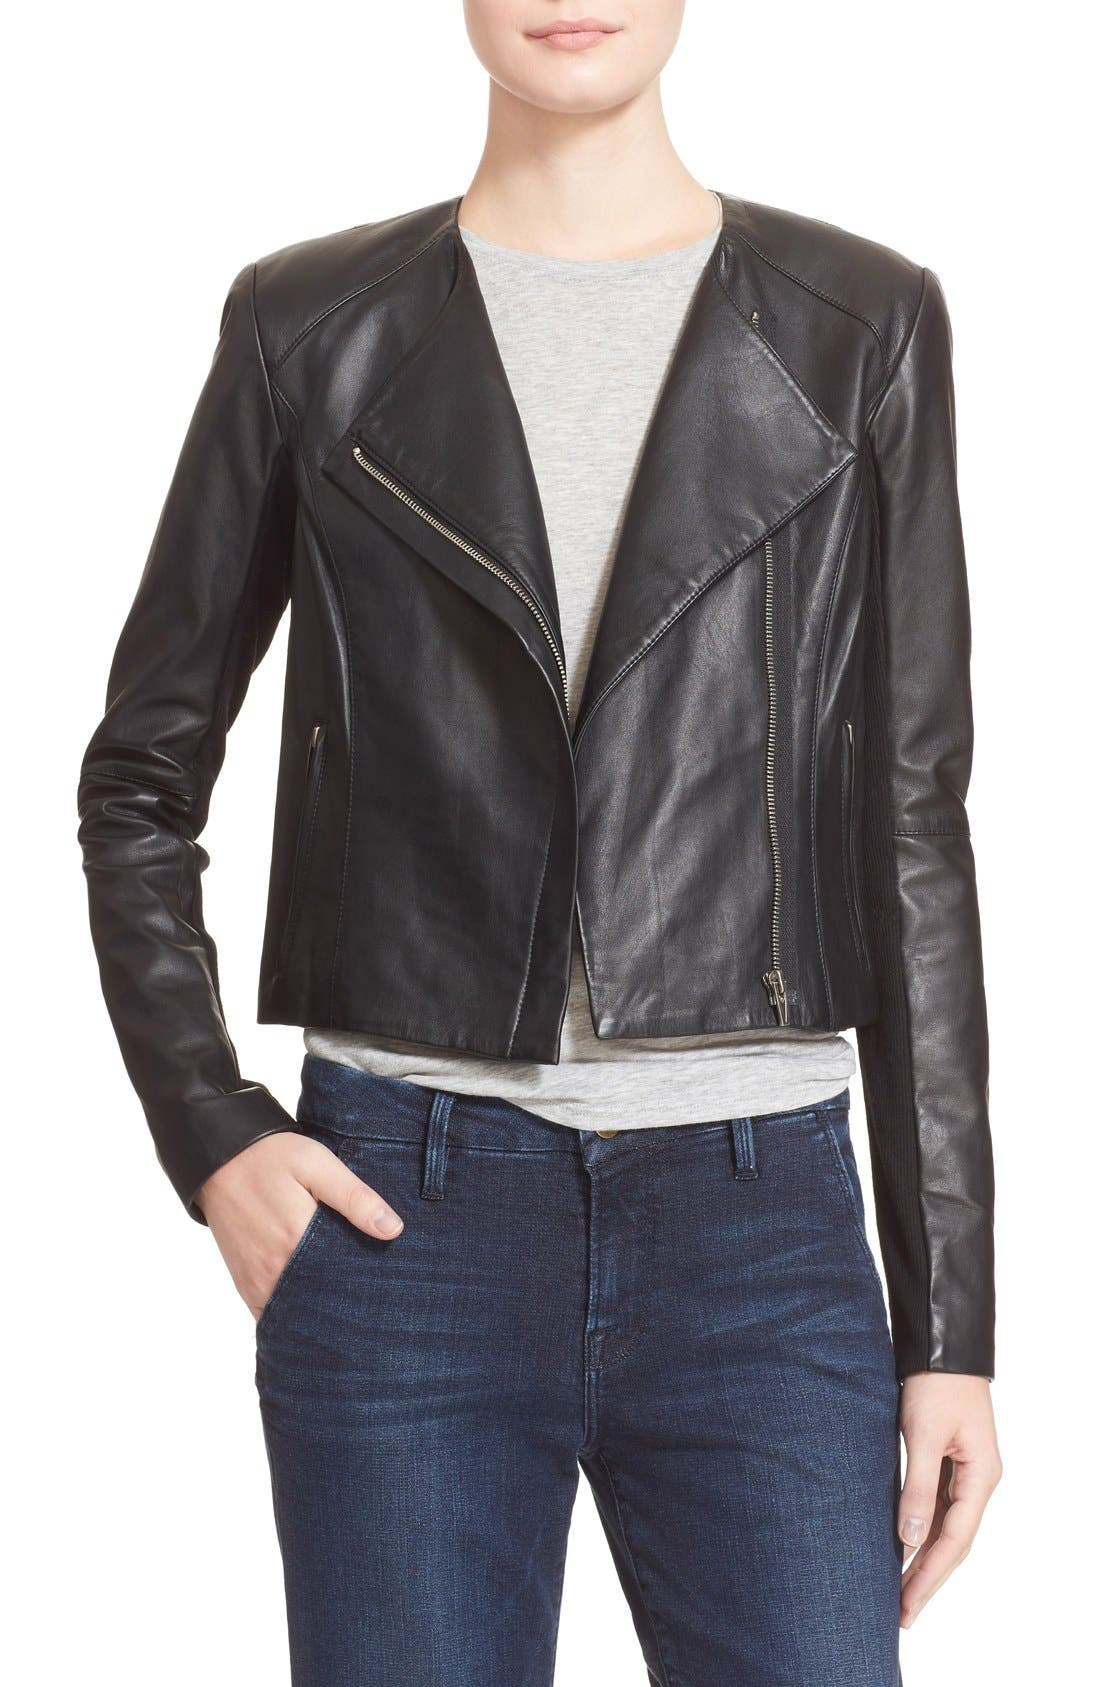 VEDA, 'Dali' Leather Jacket, Main thumbnail 1, color, 001